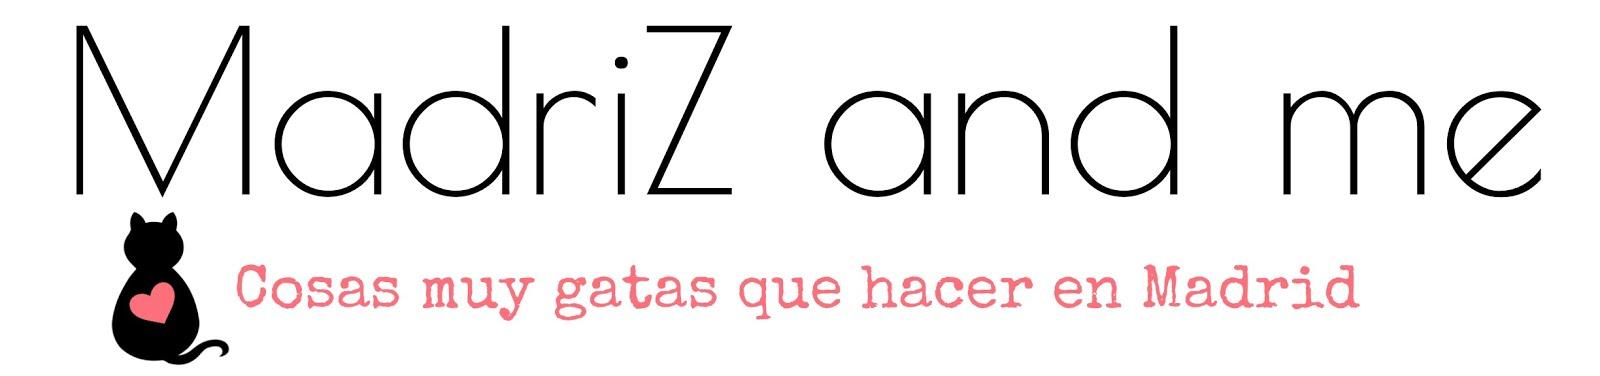 Madriz and me: Qué hacer en Madrid